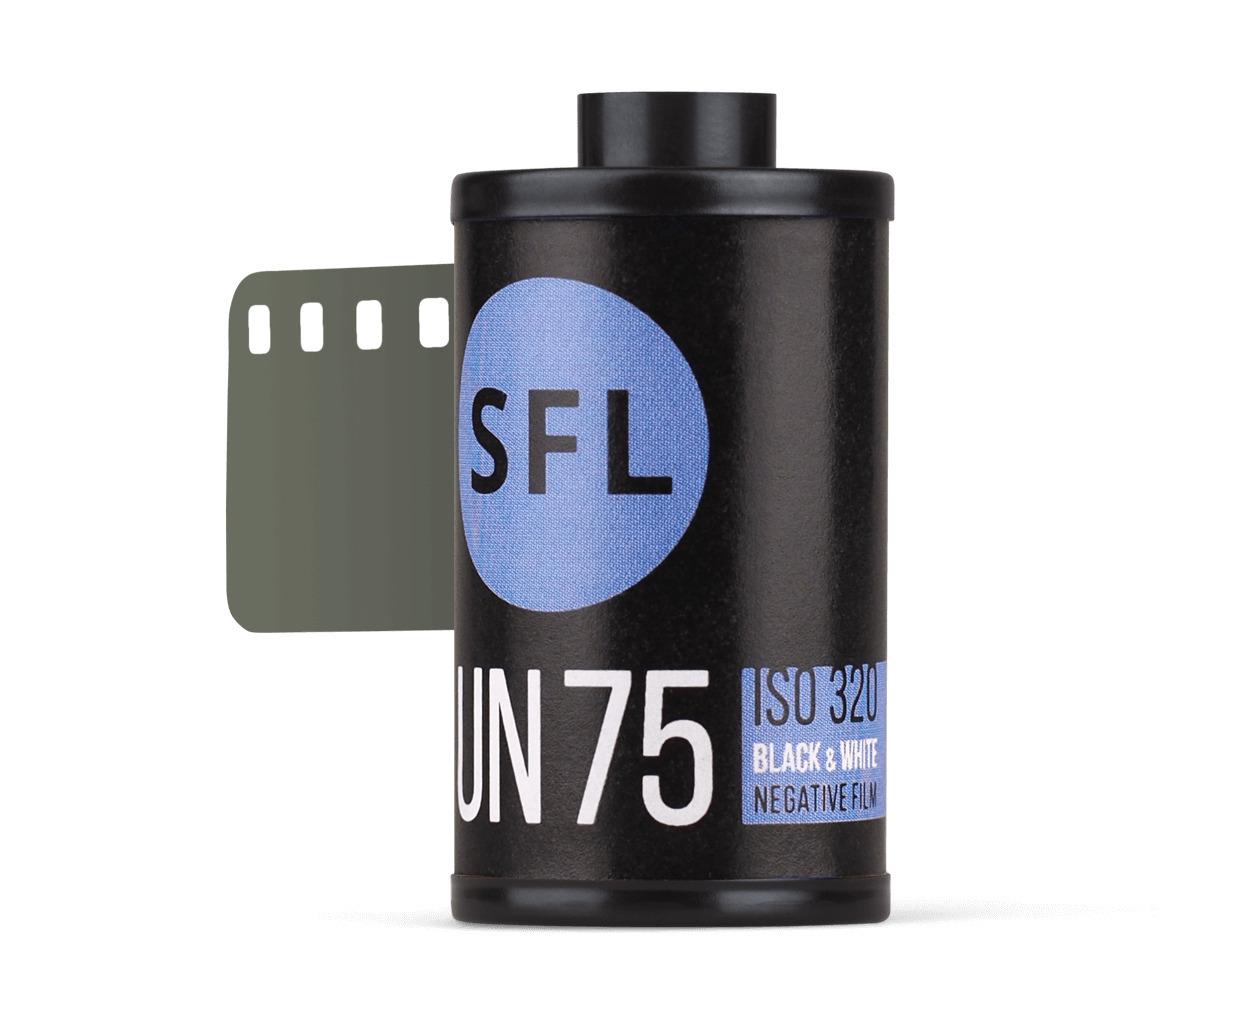 фотопленка sfl orwo un75 (135/36) ч/б негативная в кассете